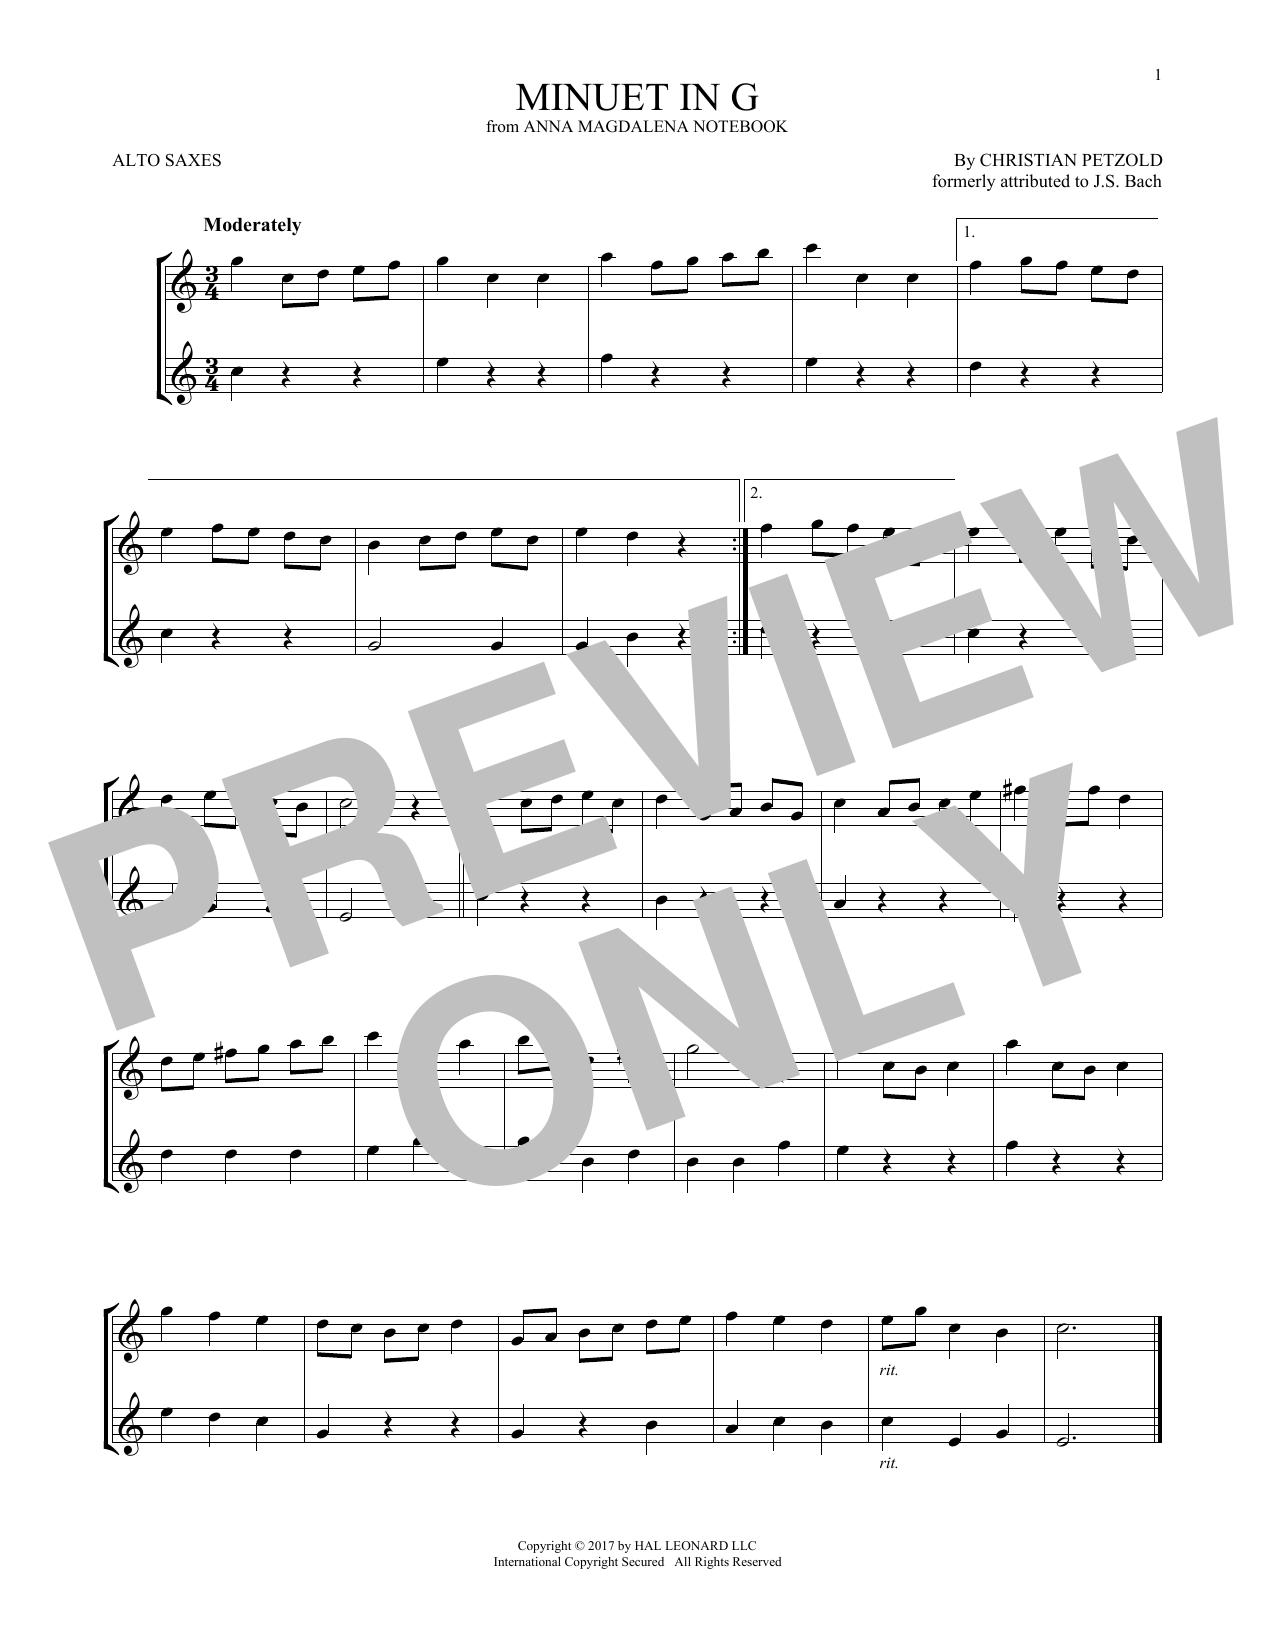 Minuet In G Major, BWV Anh. 114 (Alto Sax Duet)